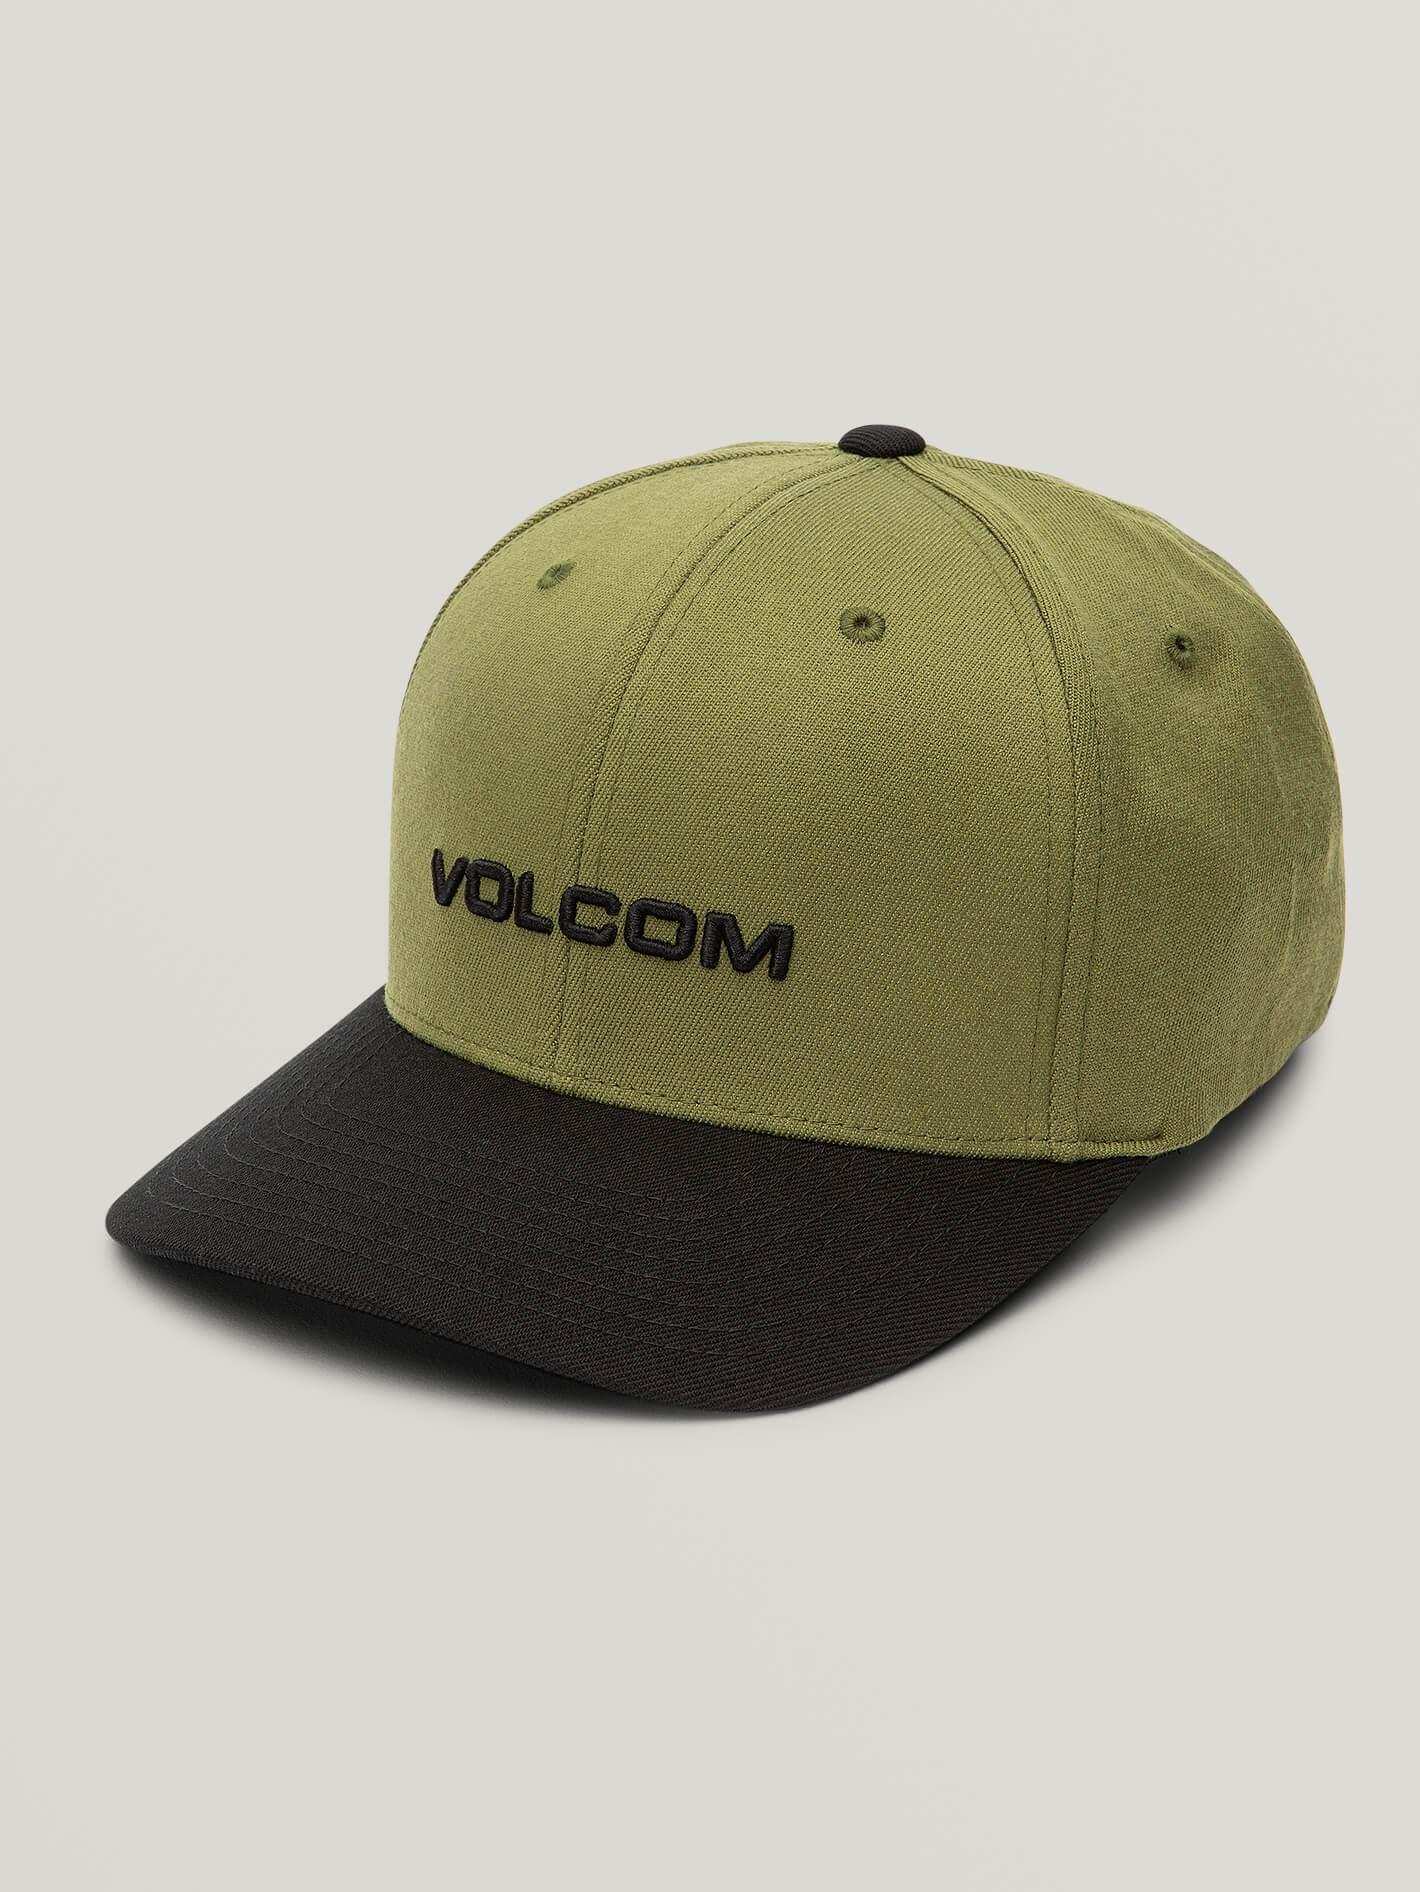 Men's Volcom Hats: Quarter Twill Hat (Brindle) $6.50, Center Stone Hat (Black) $7.50, More + Free Shipping